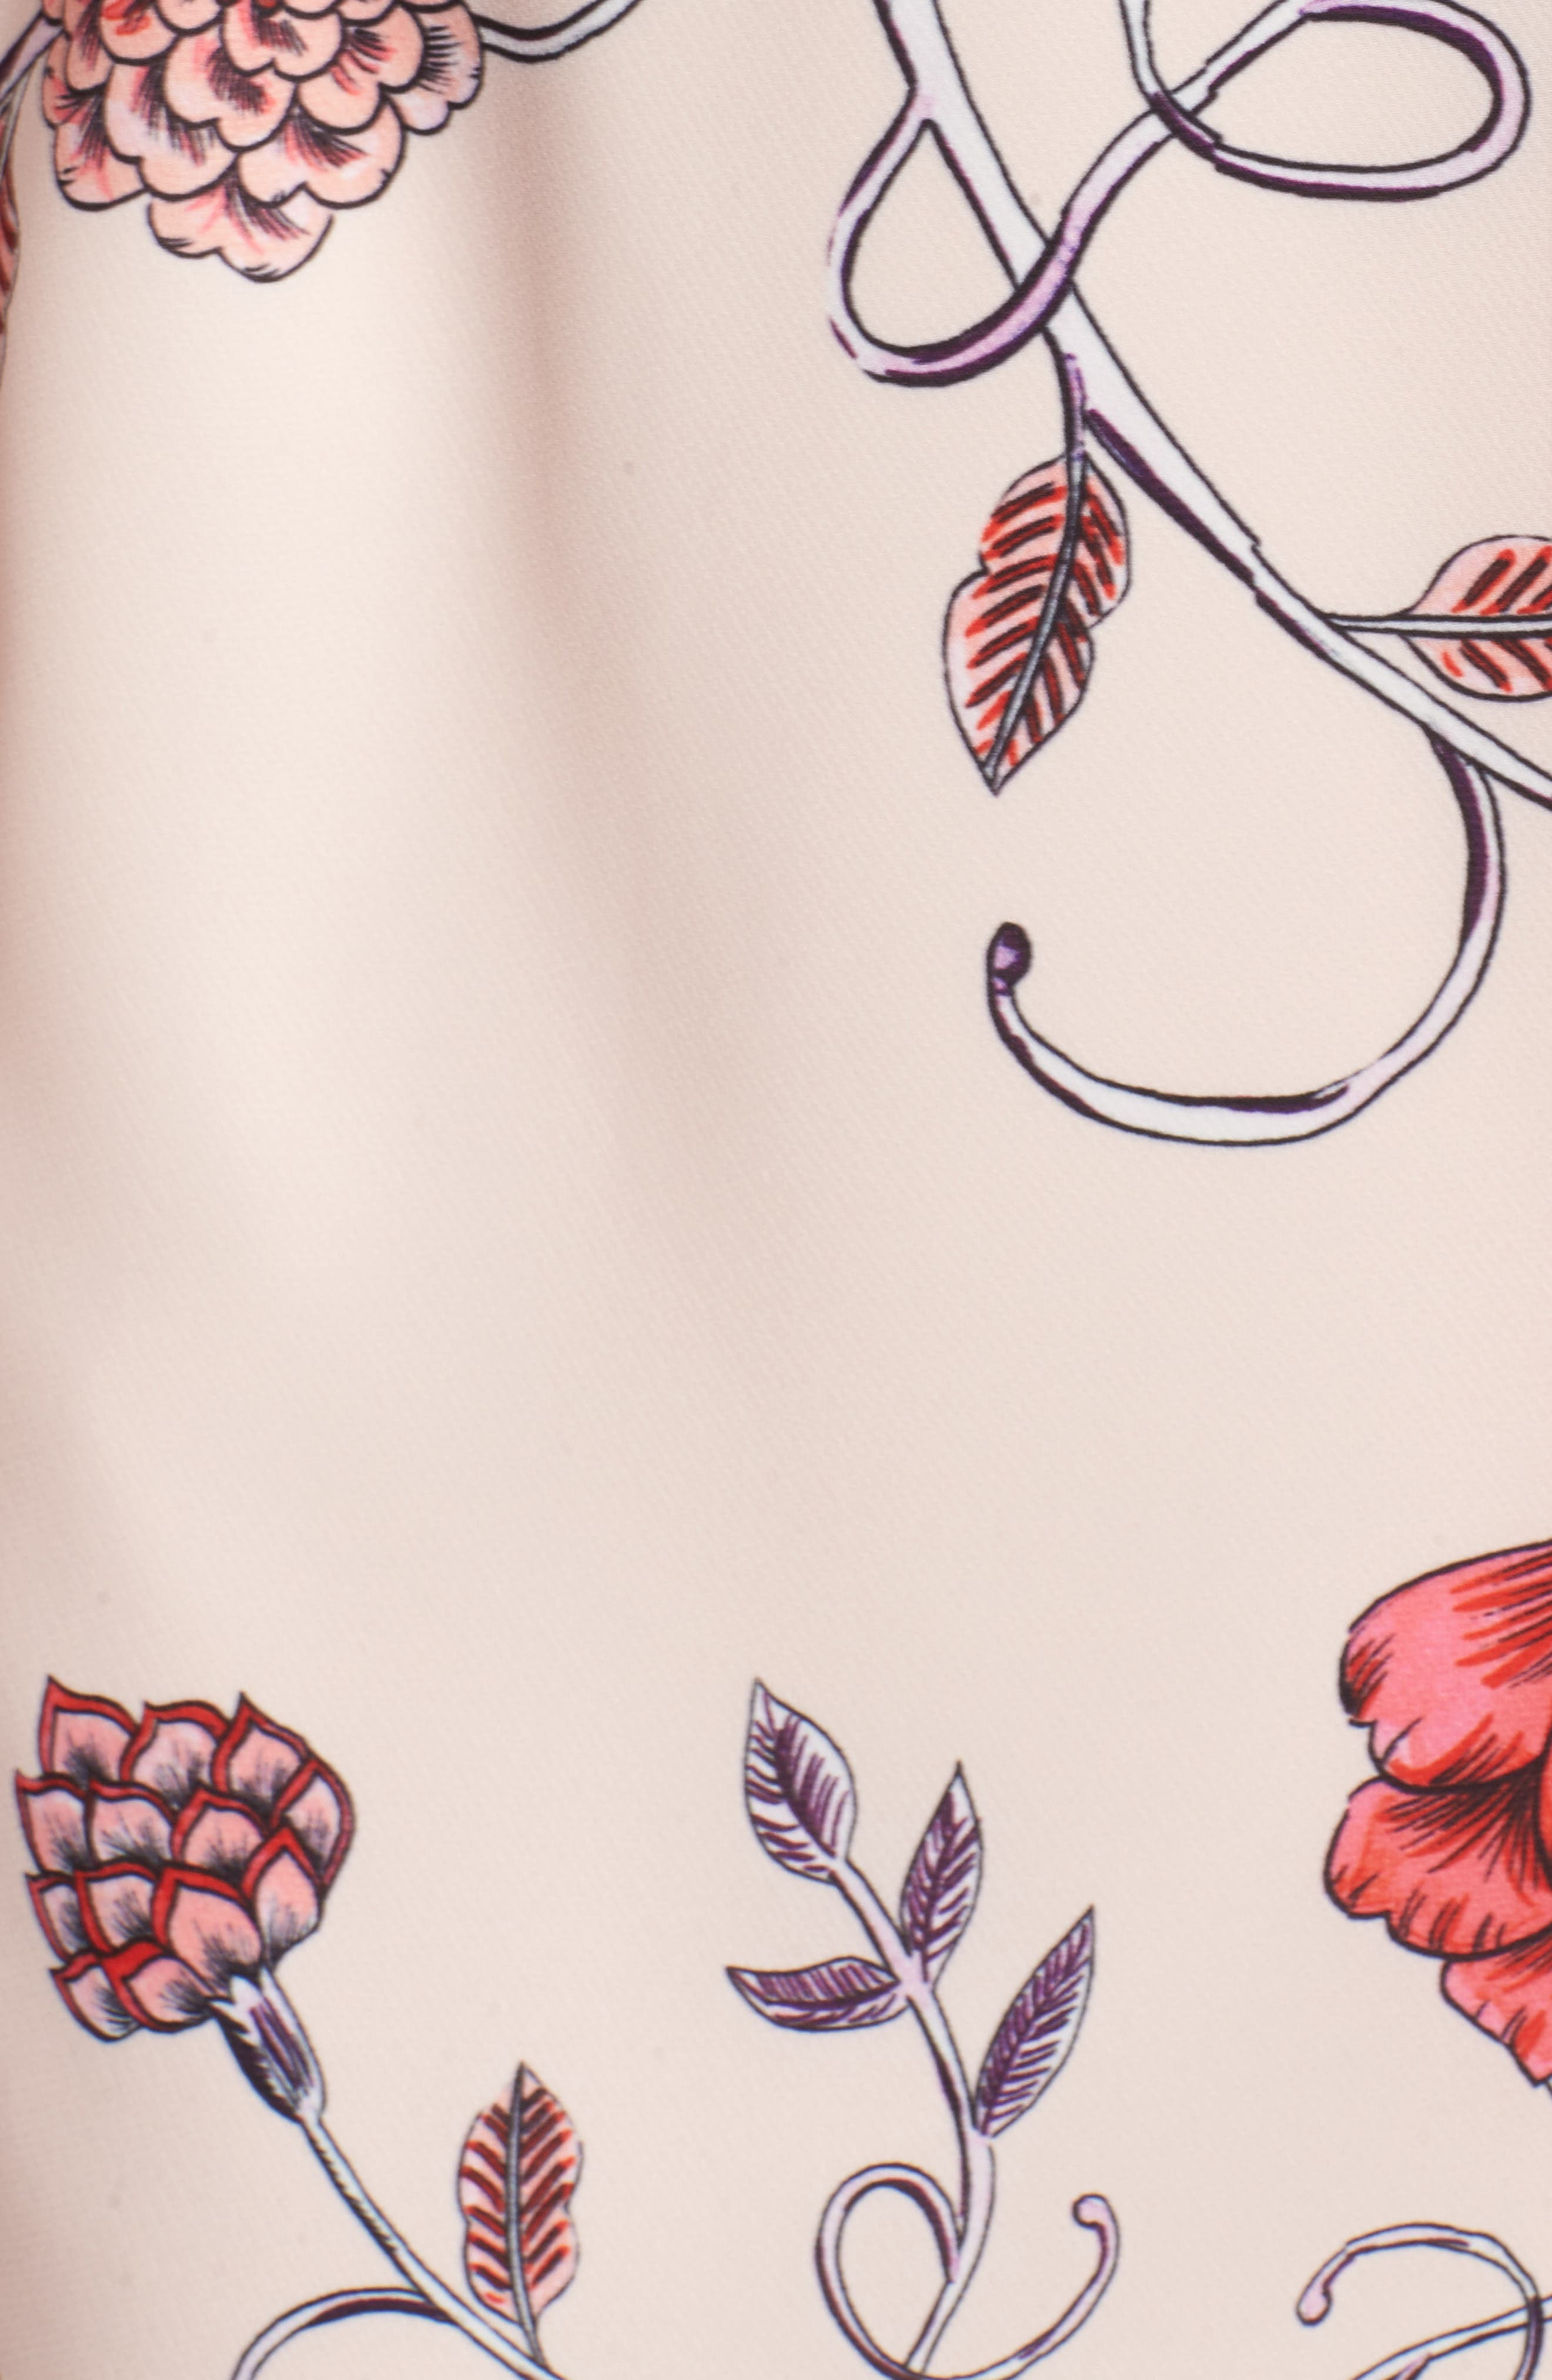 Sakura Bell Sleeve Dress,                             Alternate thumbnail 5, color,                             Pink Print